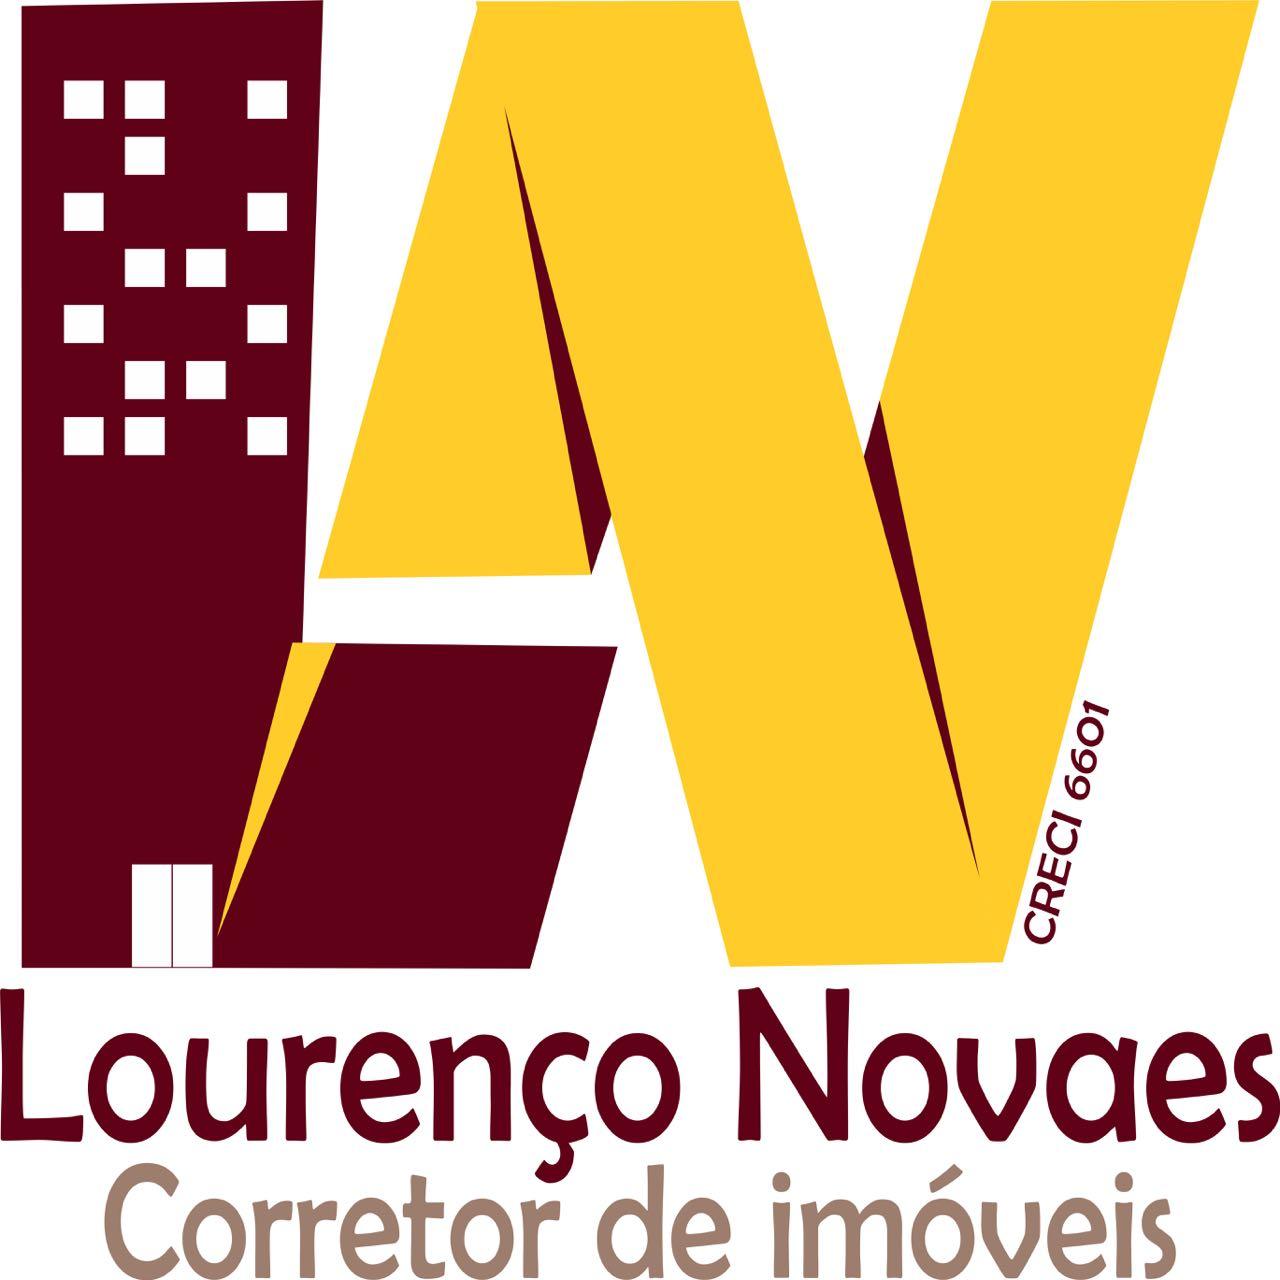 LOURENÇO NOVAES IMÓVEIS